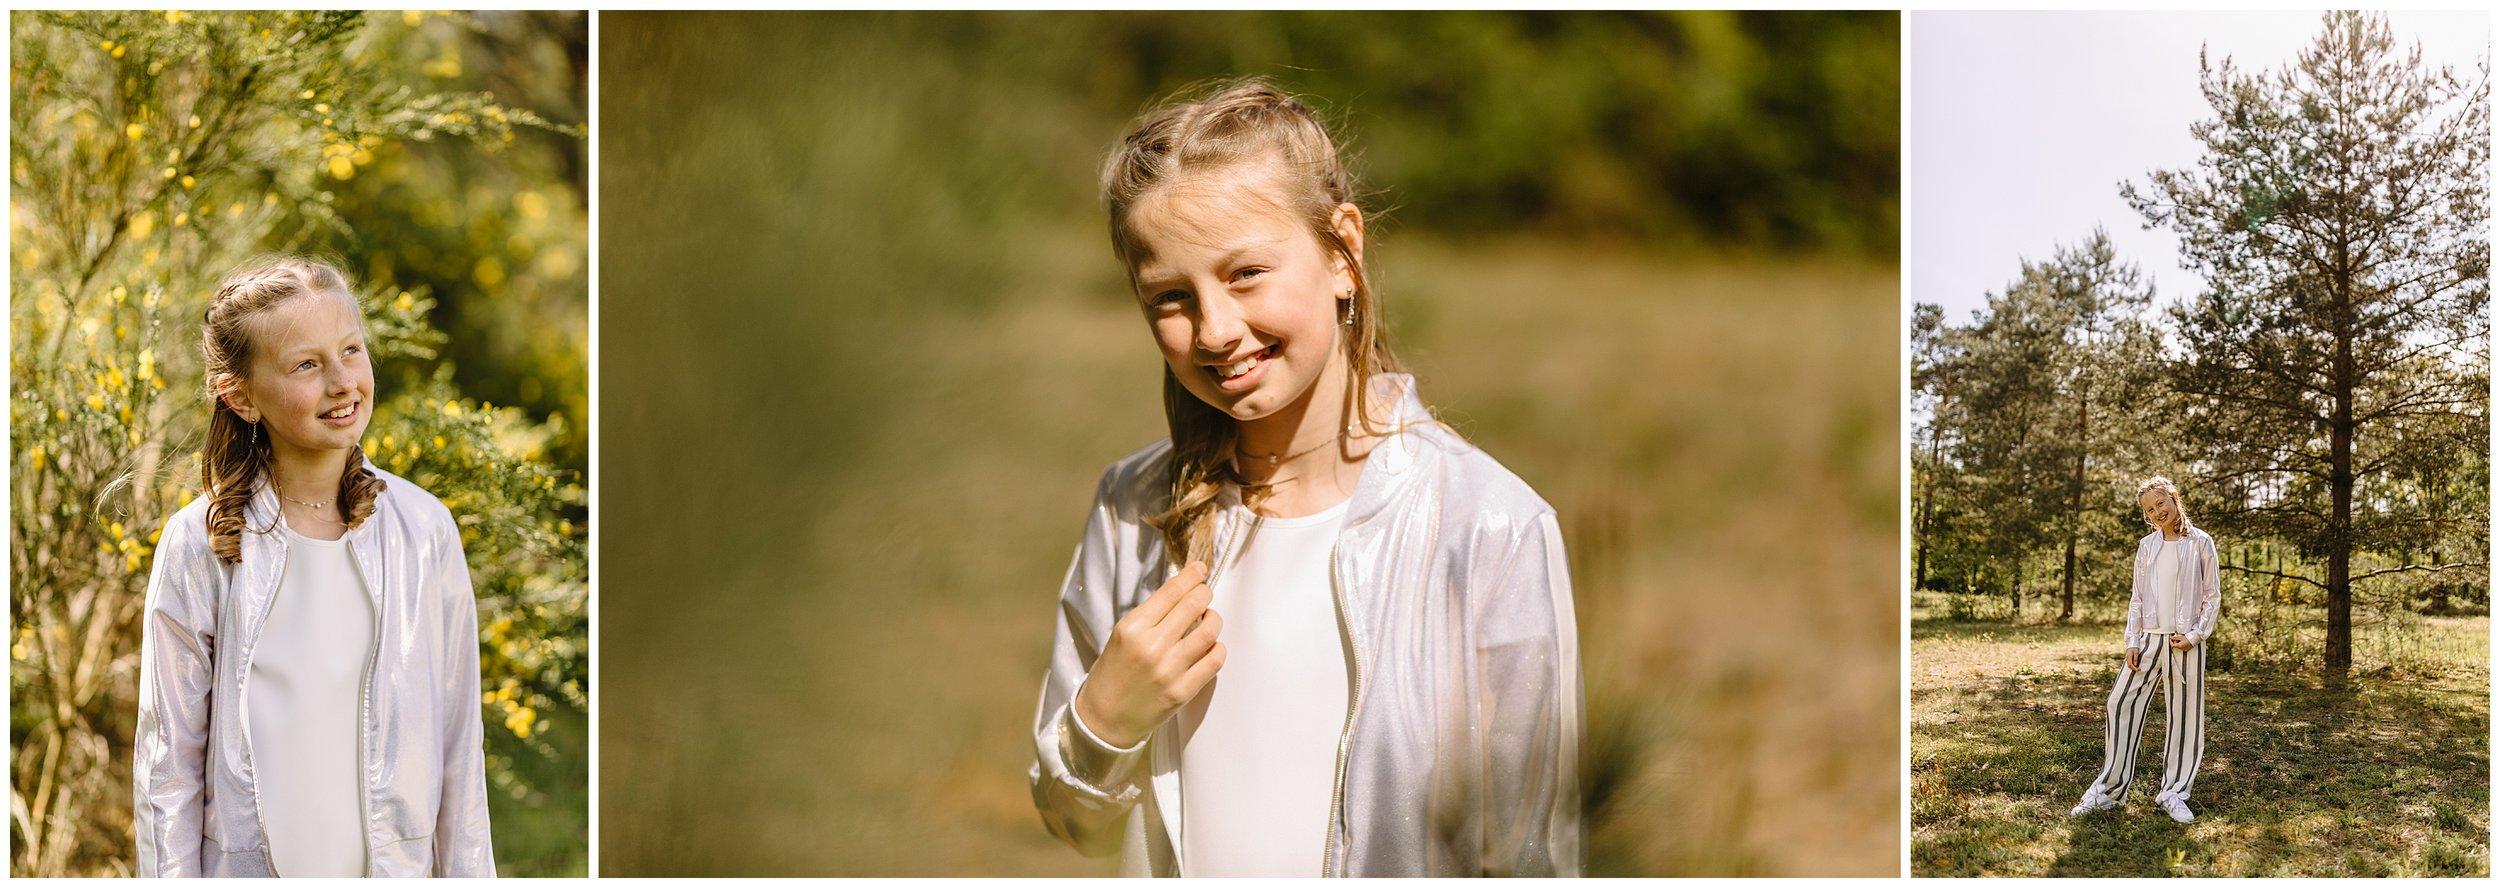 communiefotografie-communie-kempen-lisa-helsen-photography_0007.jpg